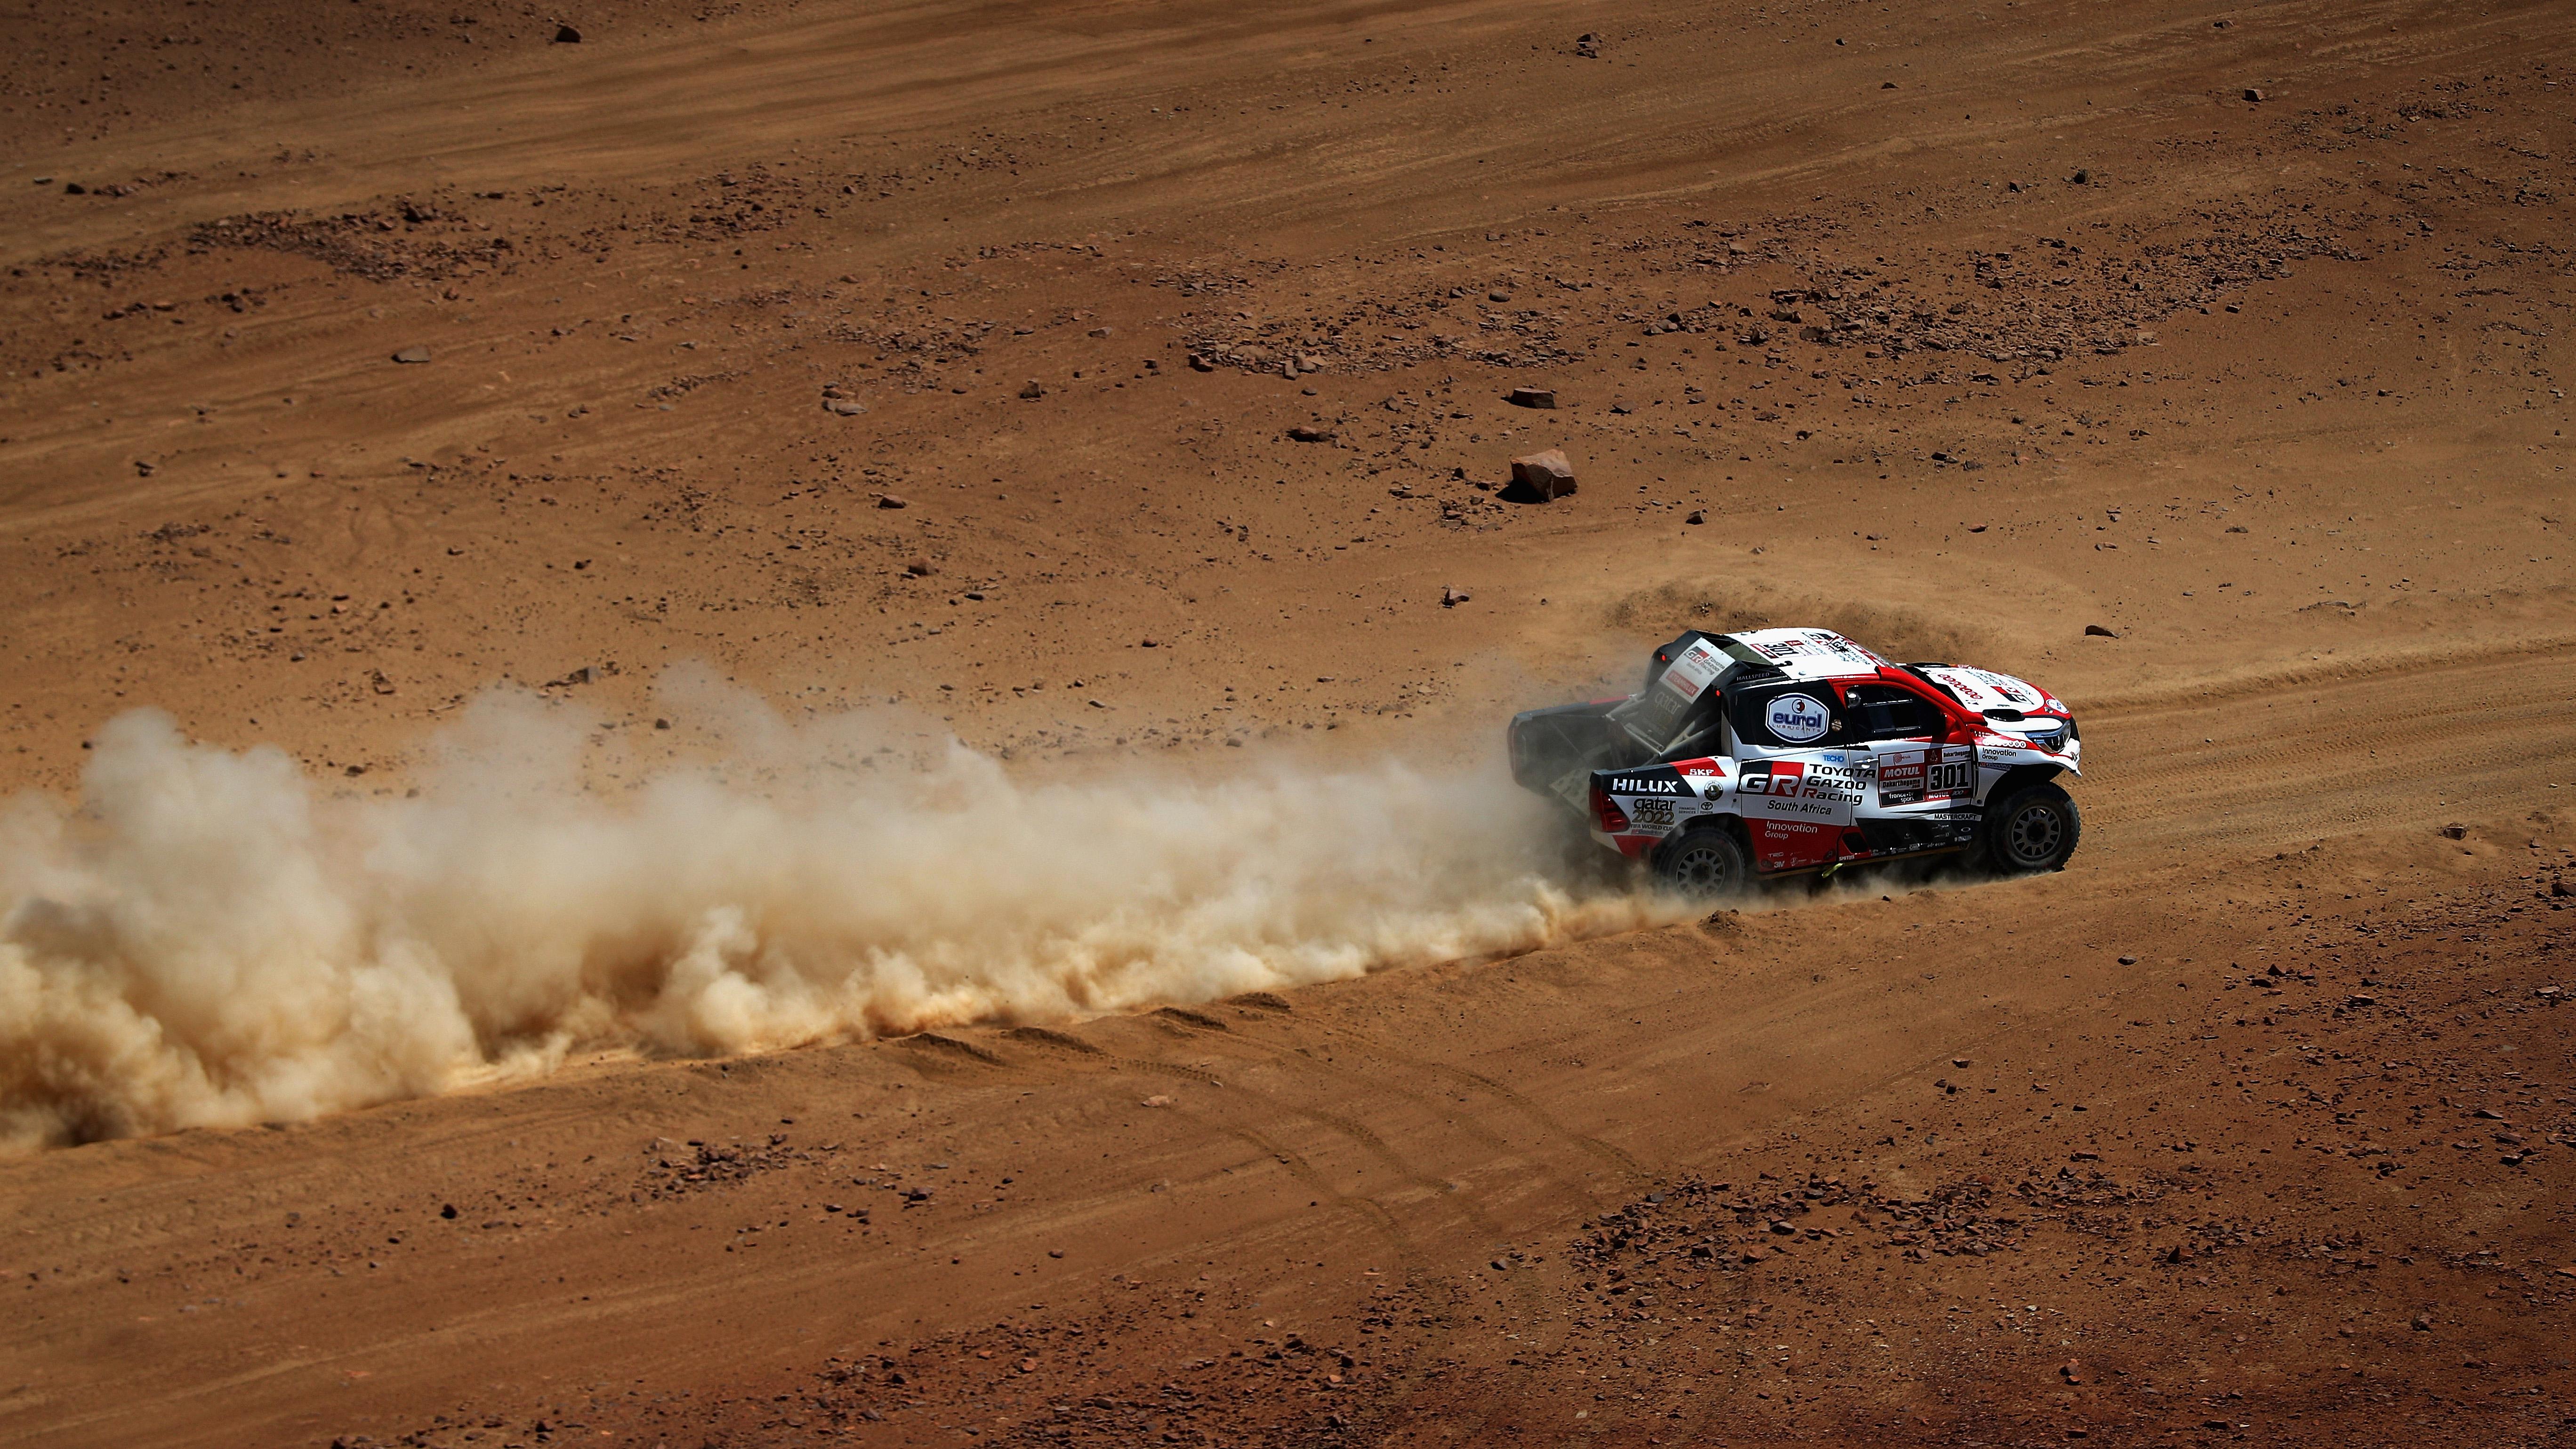 Dakar Rally headed to Saudi Arabia for 2020